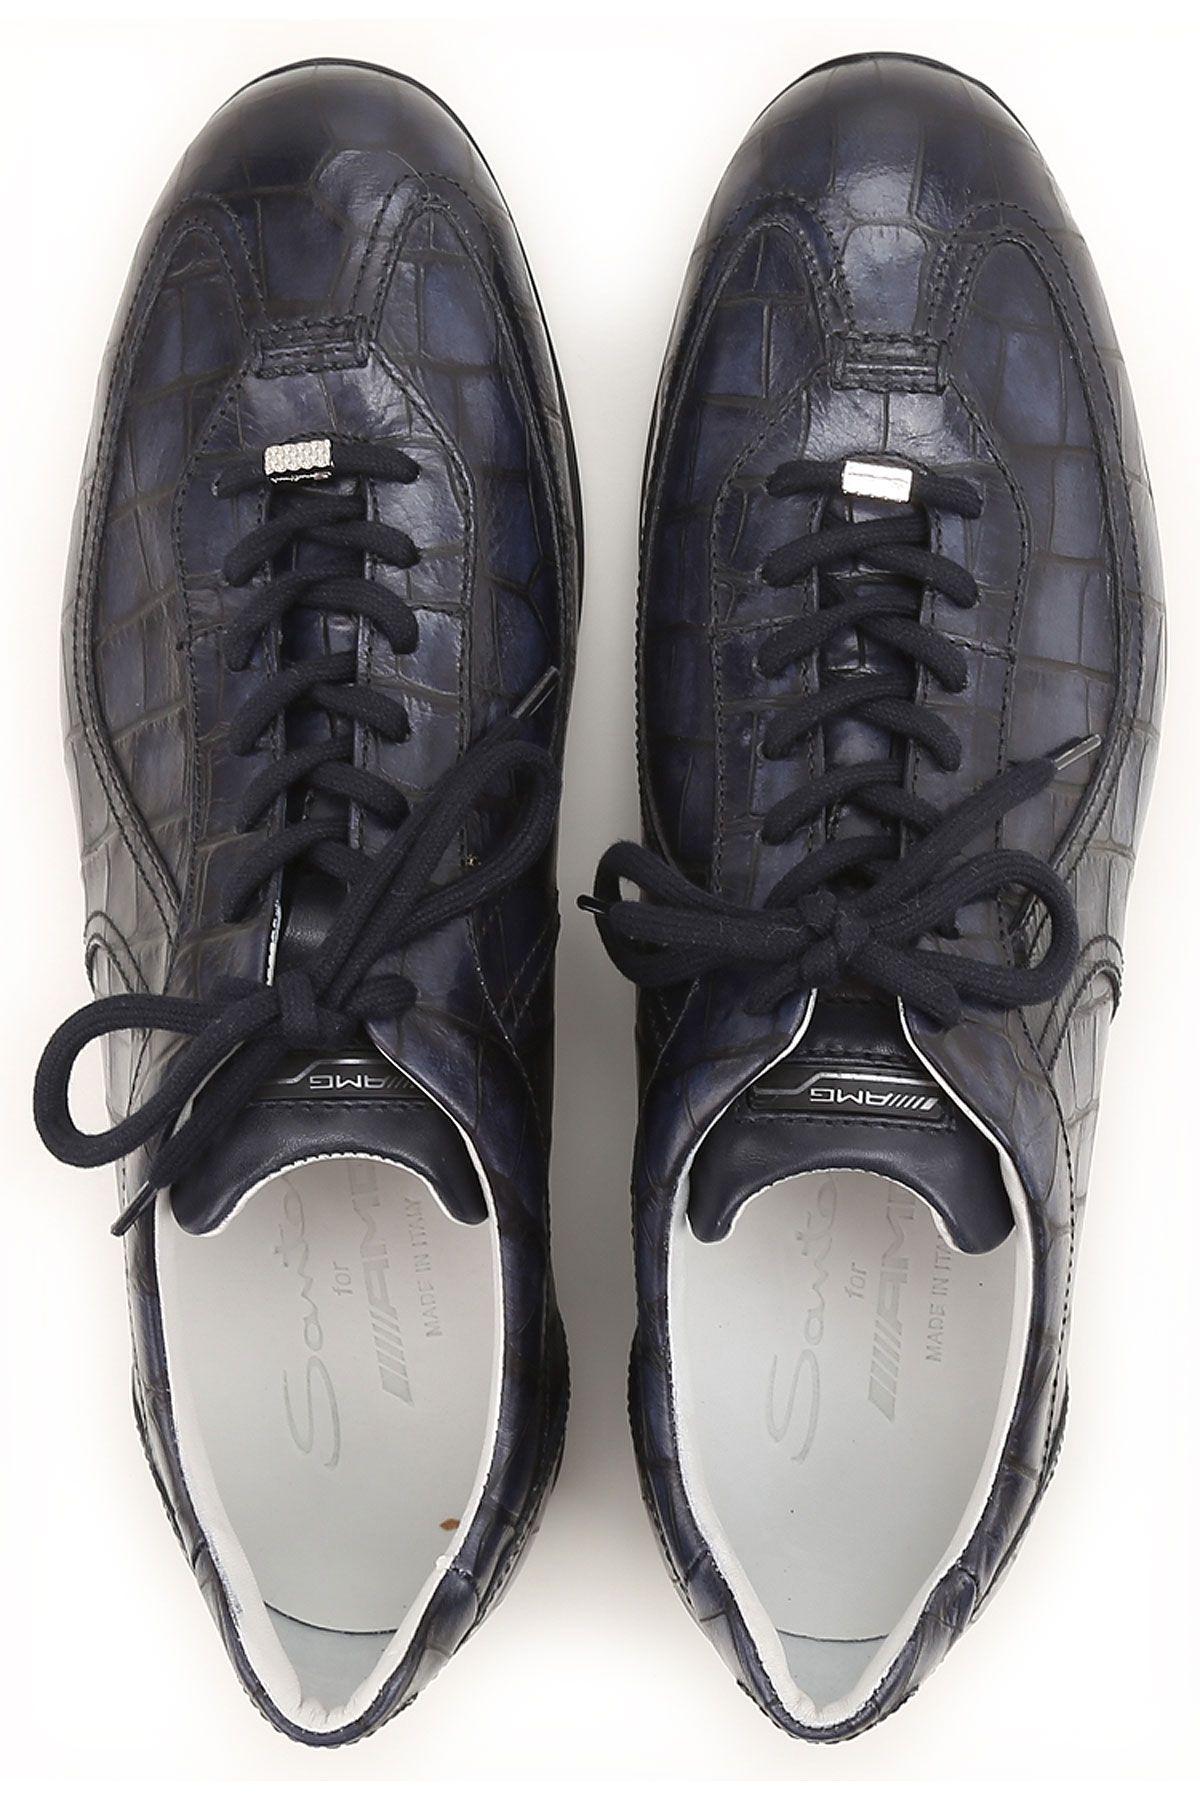 da70492b02130 SANTONI Chaussures Homme   croco   Chaussures homme, Chaussure et ...